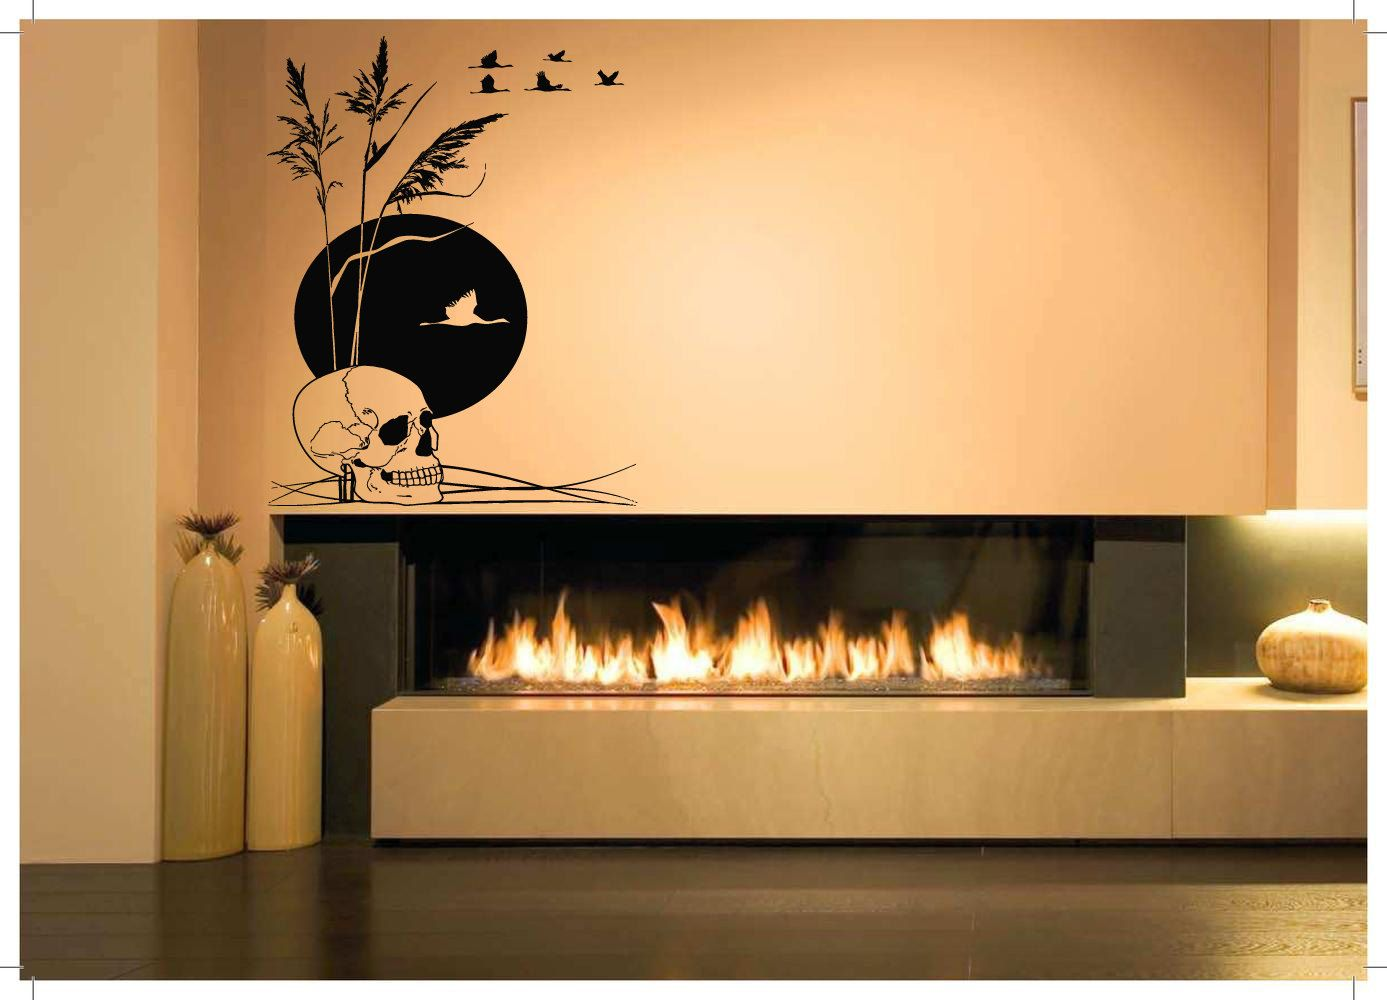 Wall Vinyl Sticker Decals Mural Room Design Bedroom Scull Moon Birds Reeds  River Skeleton Zombie Bo2836